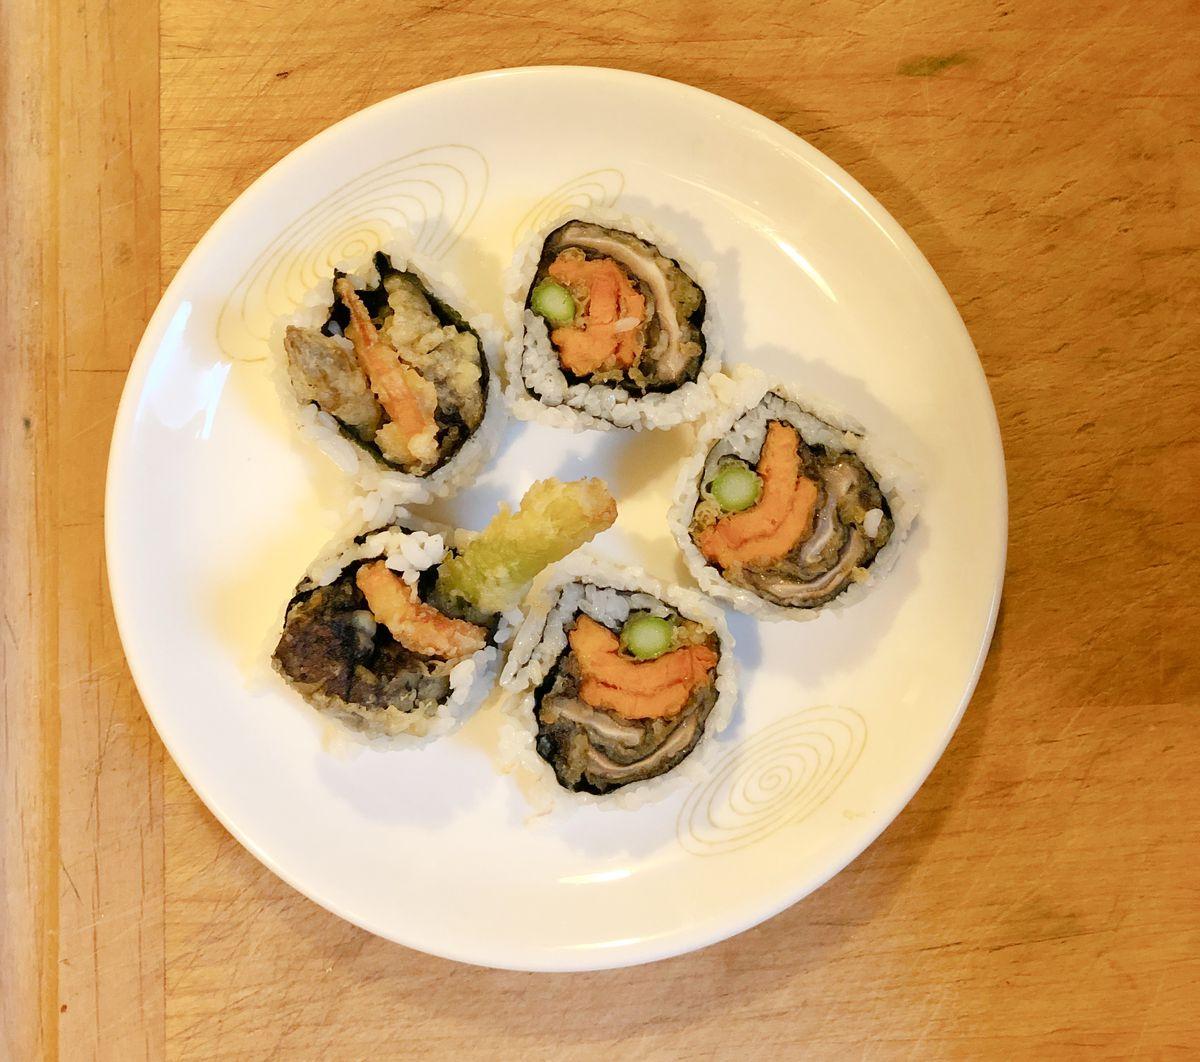 A vegetarian sushi roll